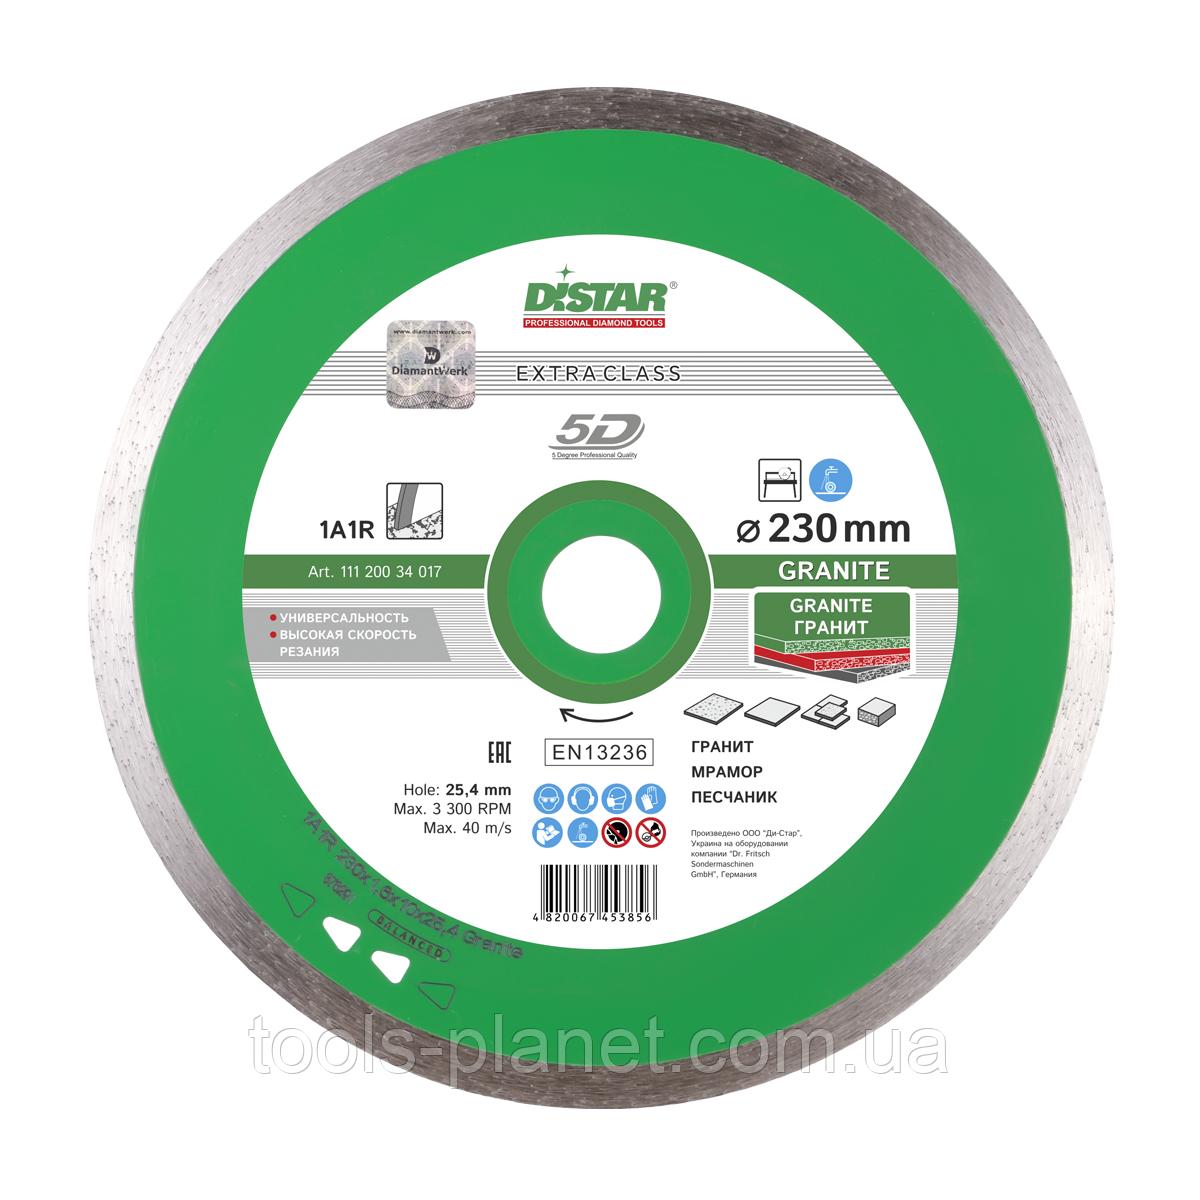 Алмазный диск Distar 1A1R 230 x 1,6 x 10 x 25,4 Granite 5D (11120034017)